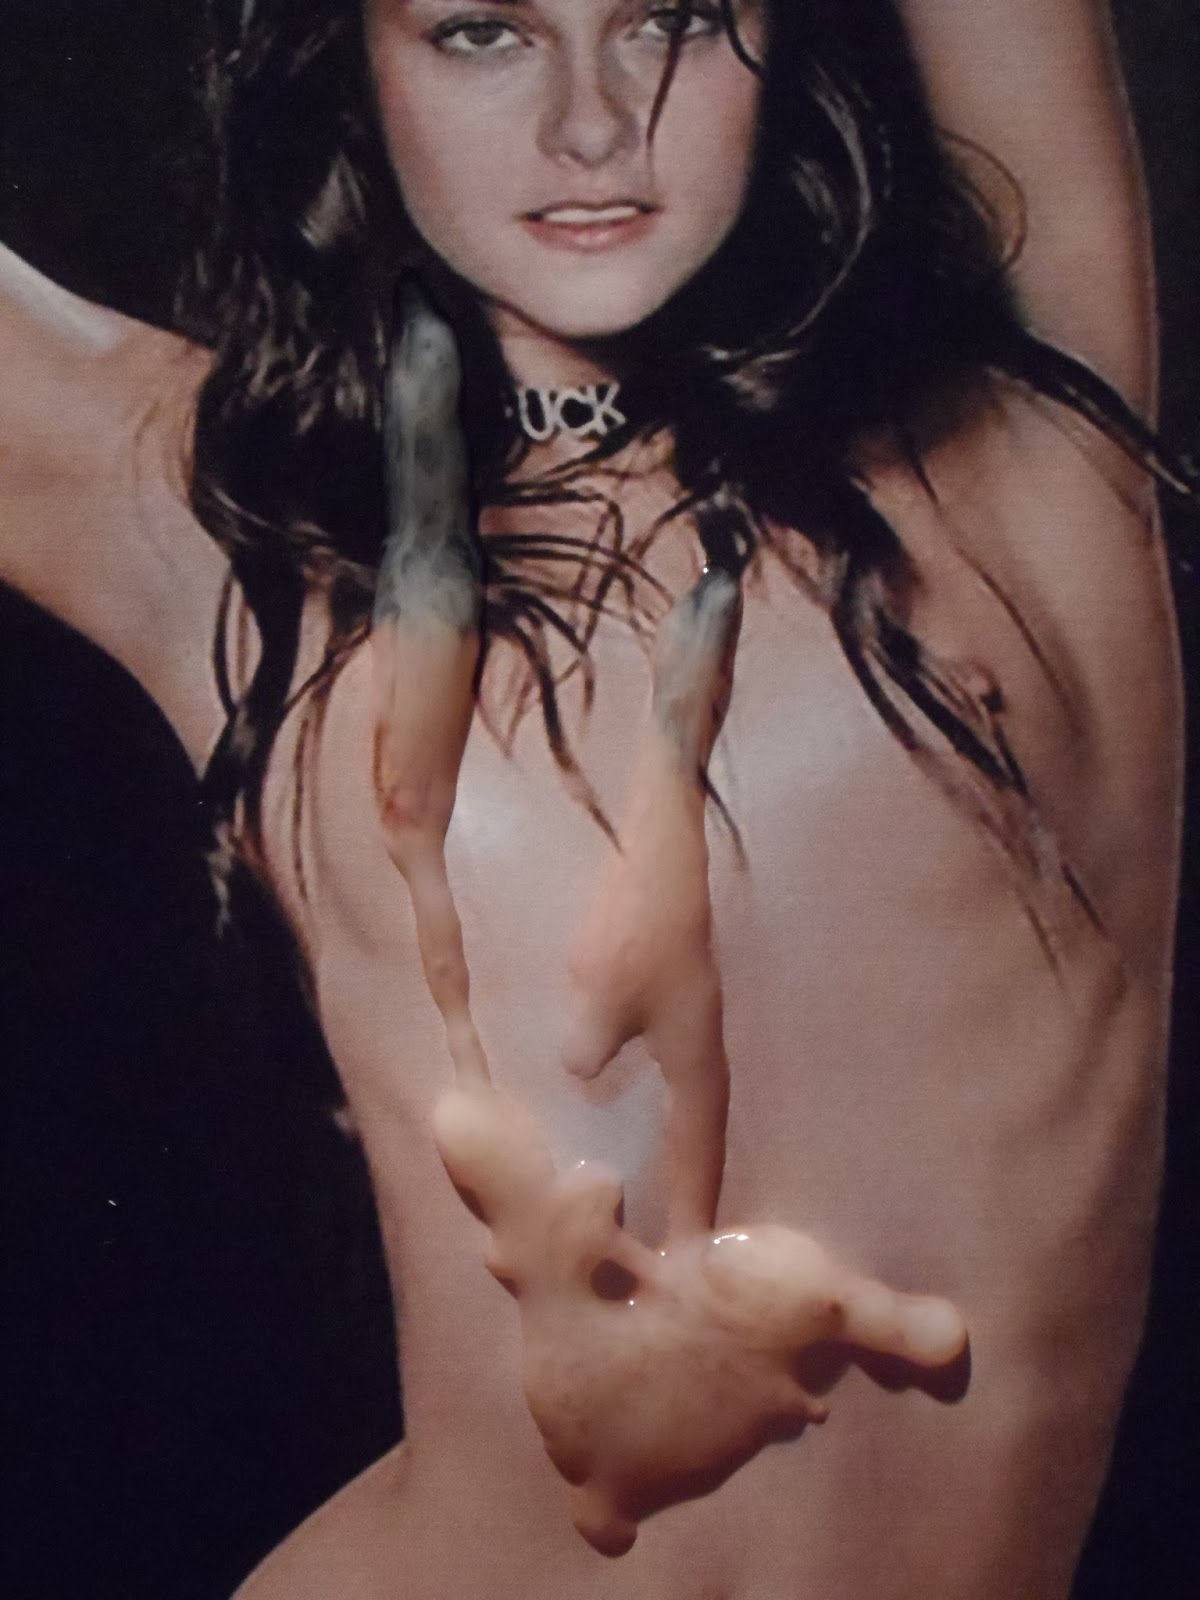 Cum On Her Face!: Kristen Stewart Poses Nude For Cum On Her Face!: jb069bj-cumonherface.blogspot.com/2013/08/kristen-stewart-poses...